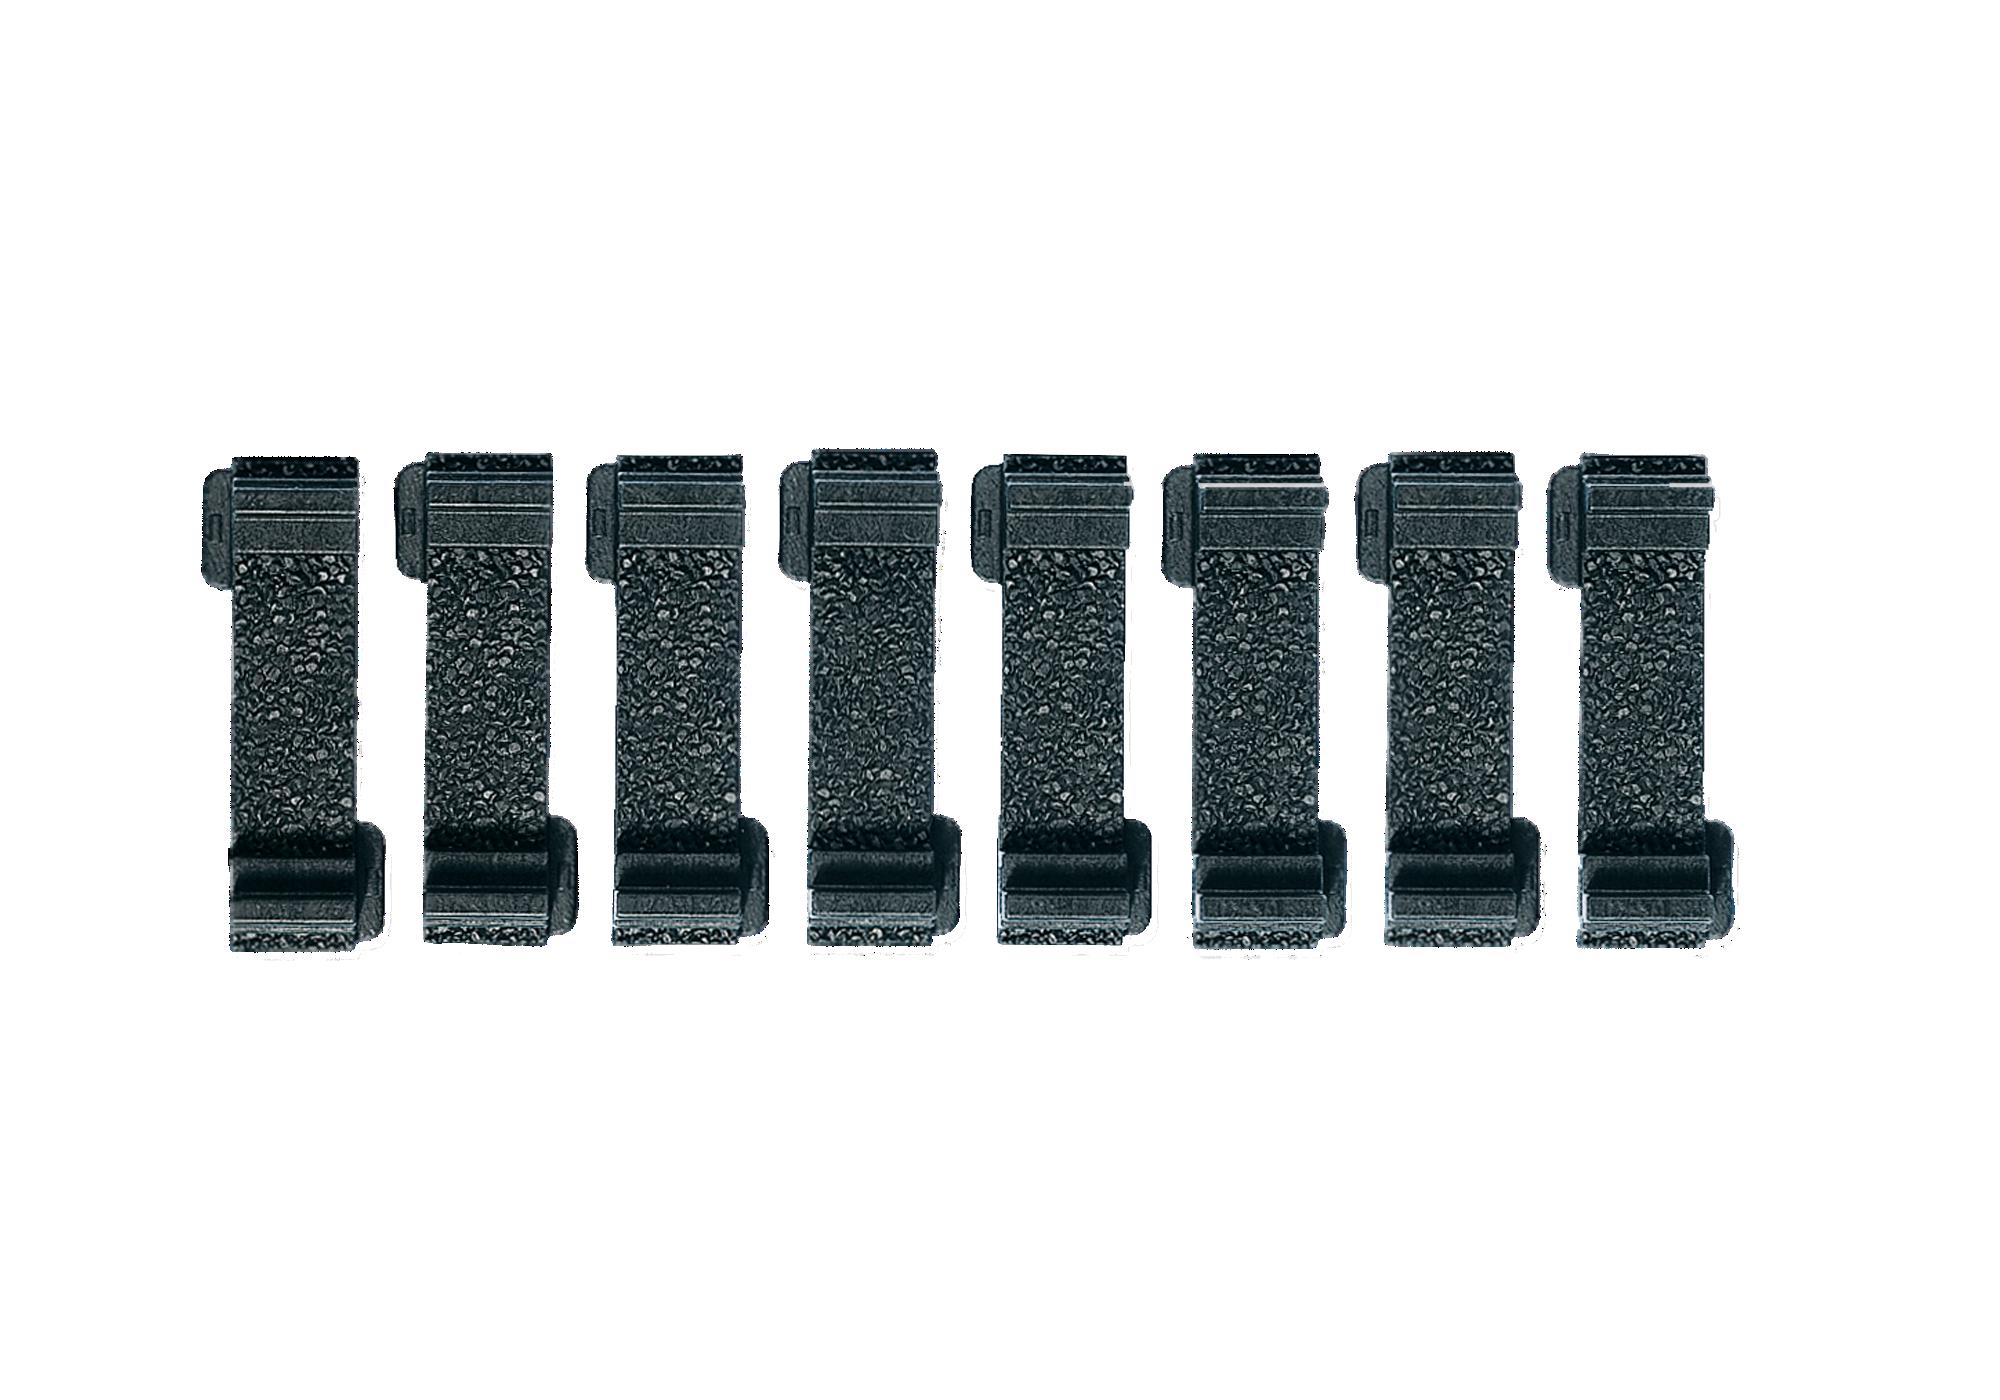 http://media.playmobil.com/i/playmobil/7357_product_detail/8 Adjustment Pieces